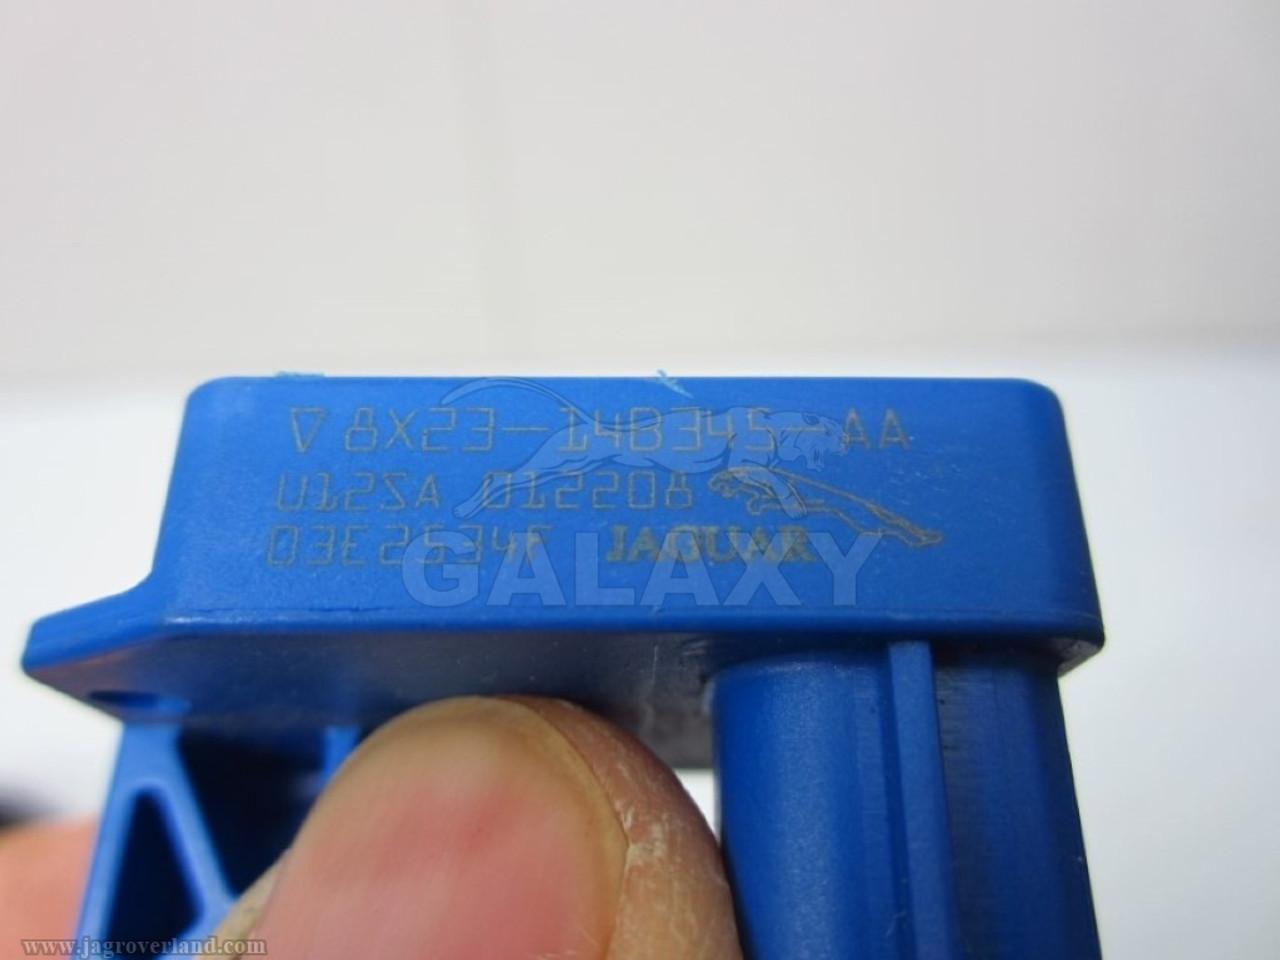 8X23-14B345-AA C2Z3413 Genuine Jaguar XF X250 Airbag Sensor